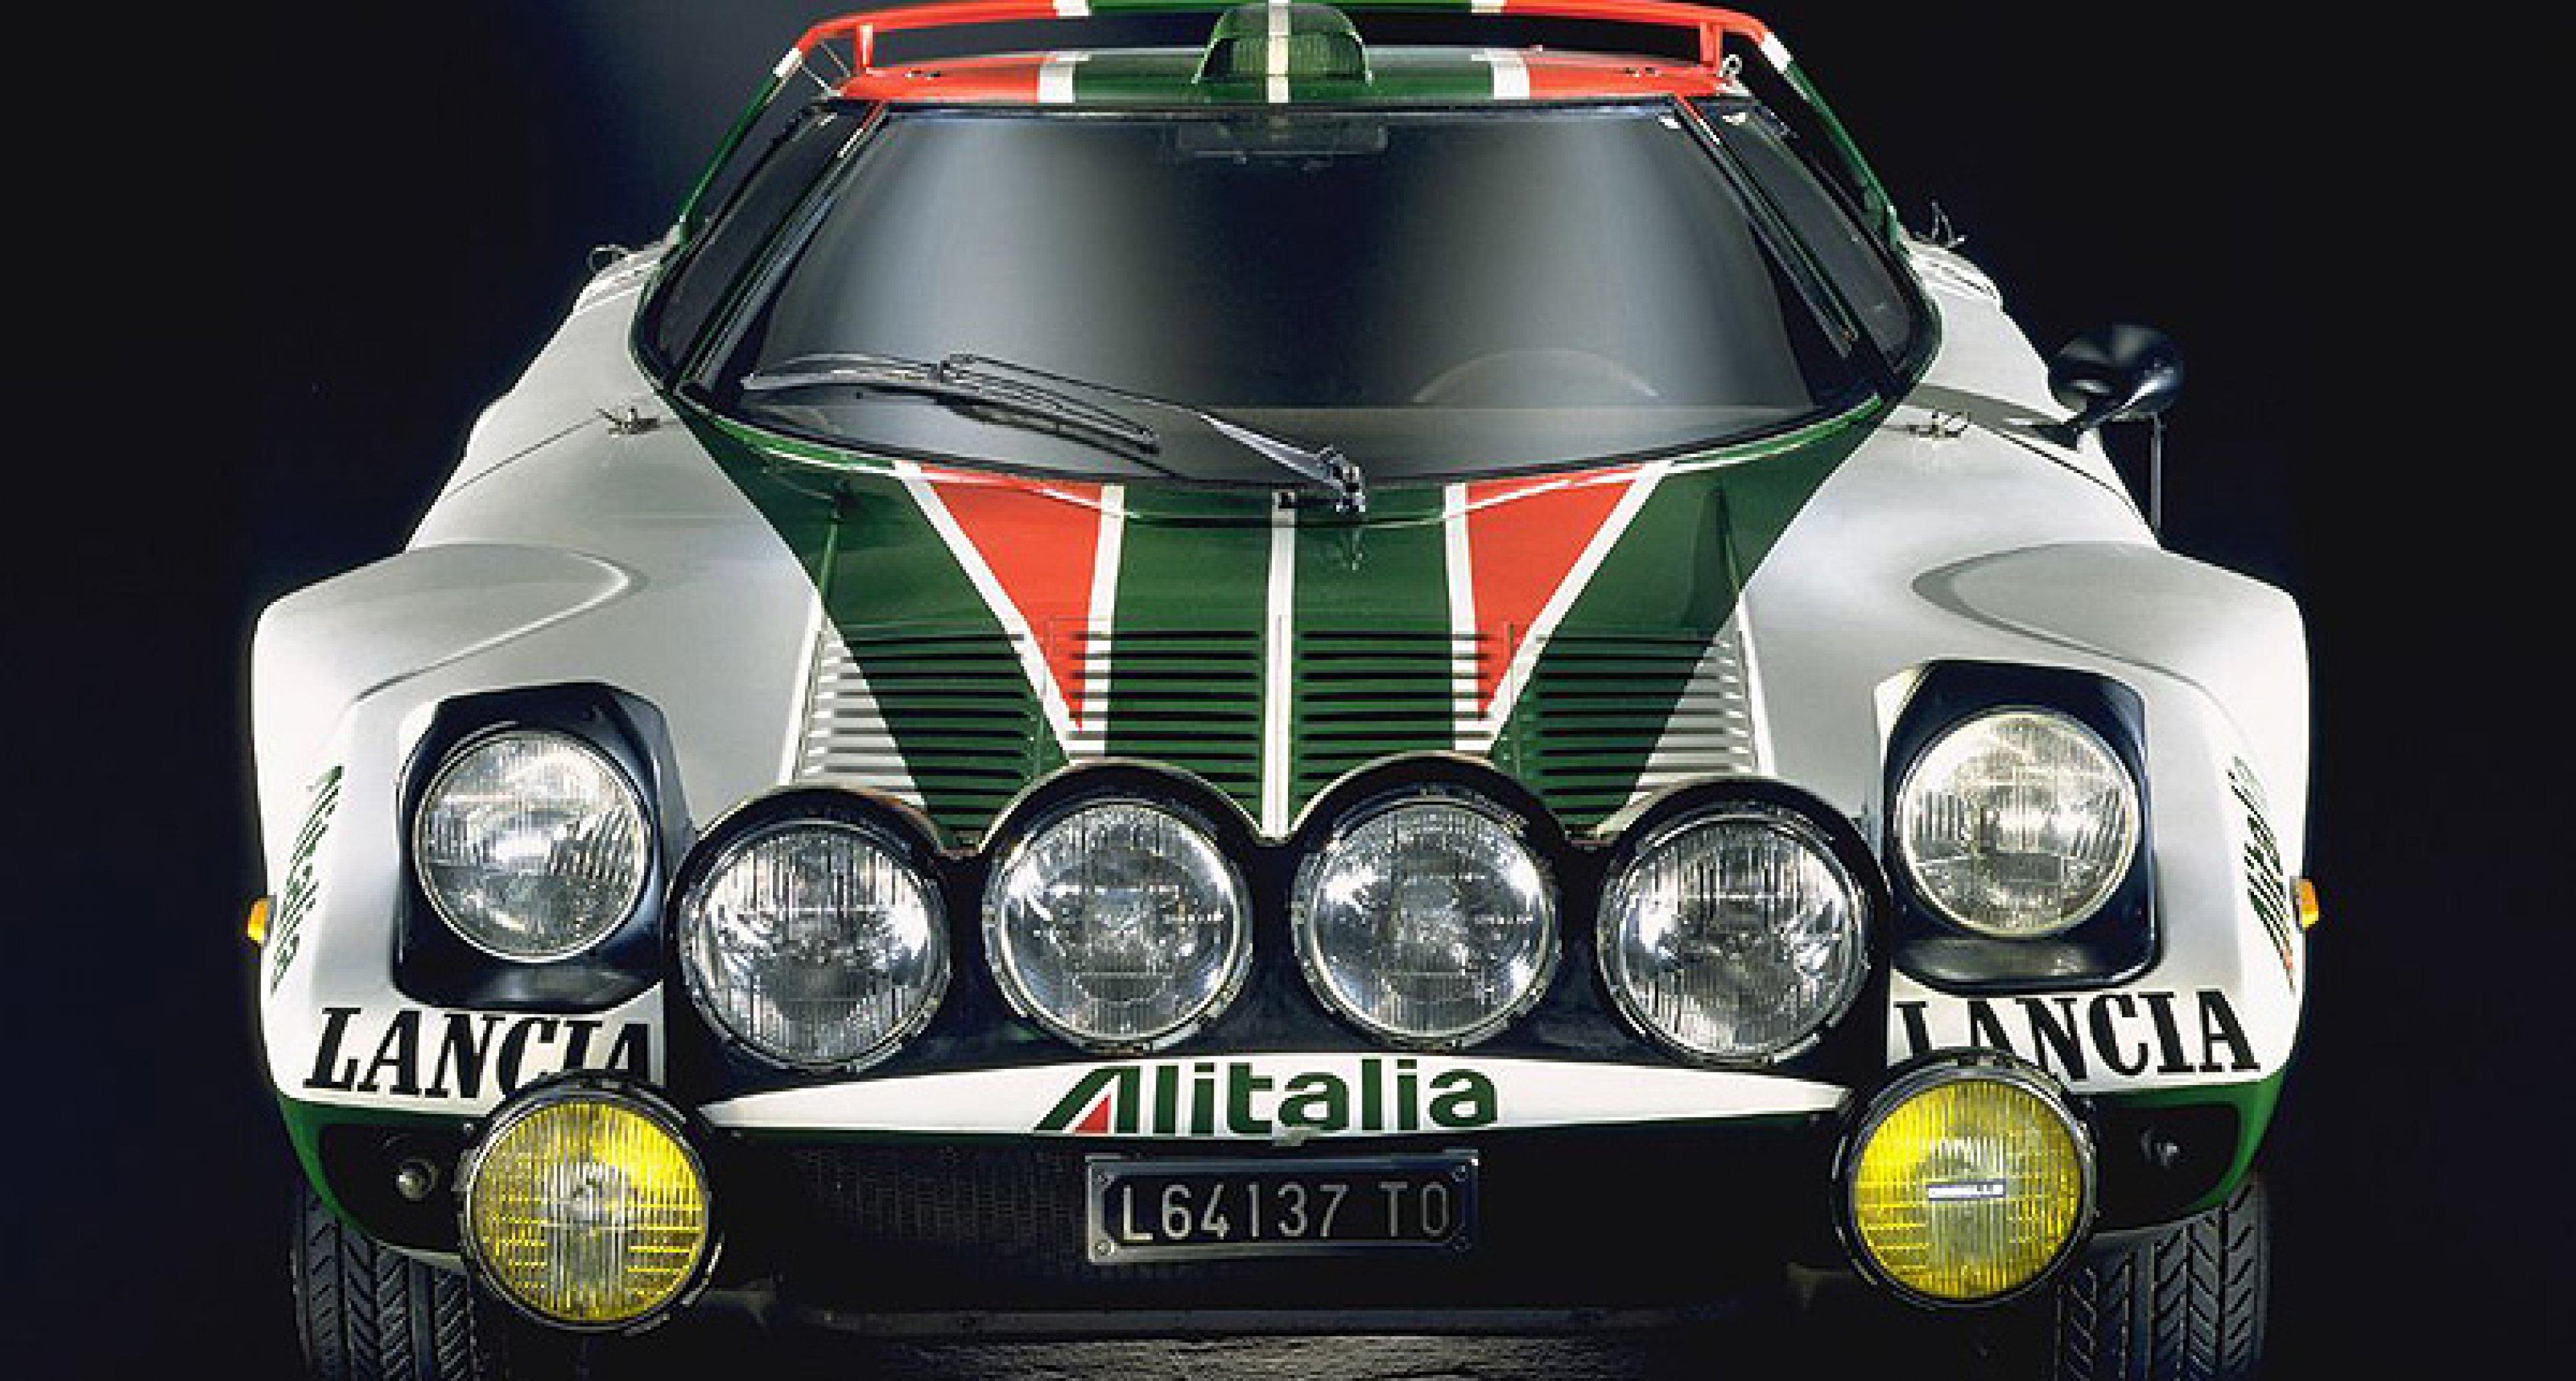 Lancia Youngtimer